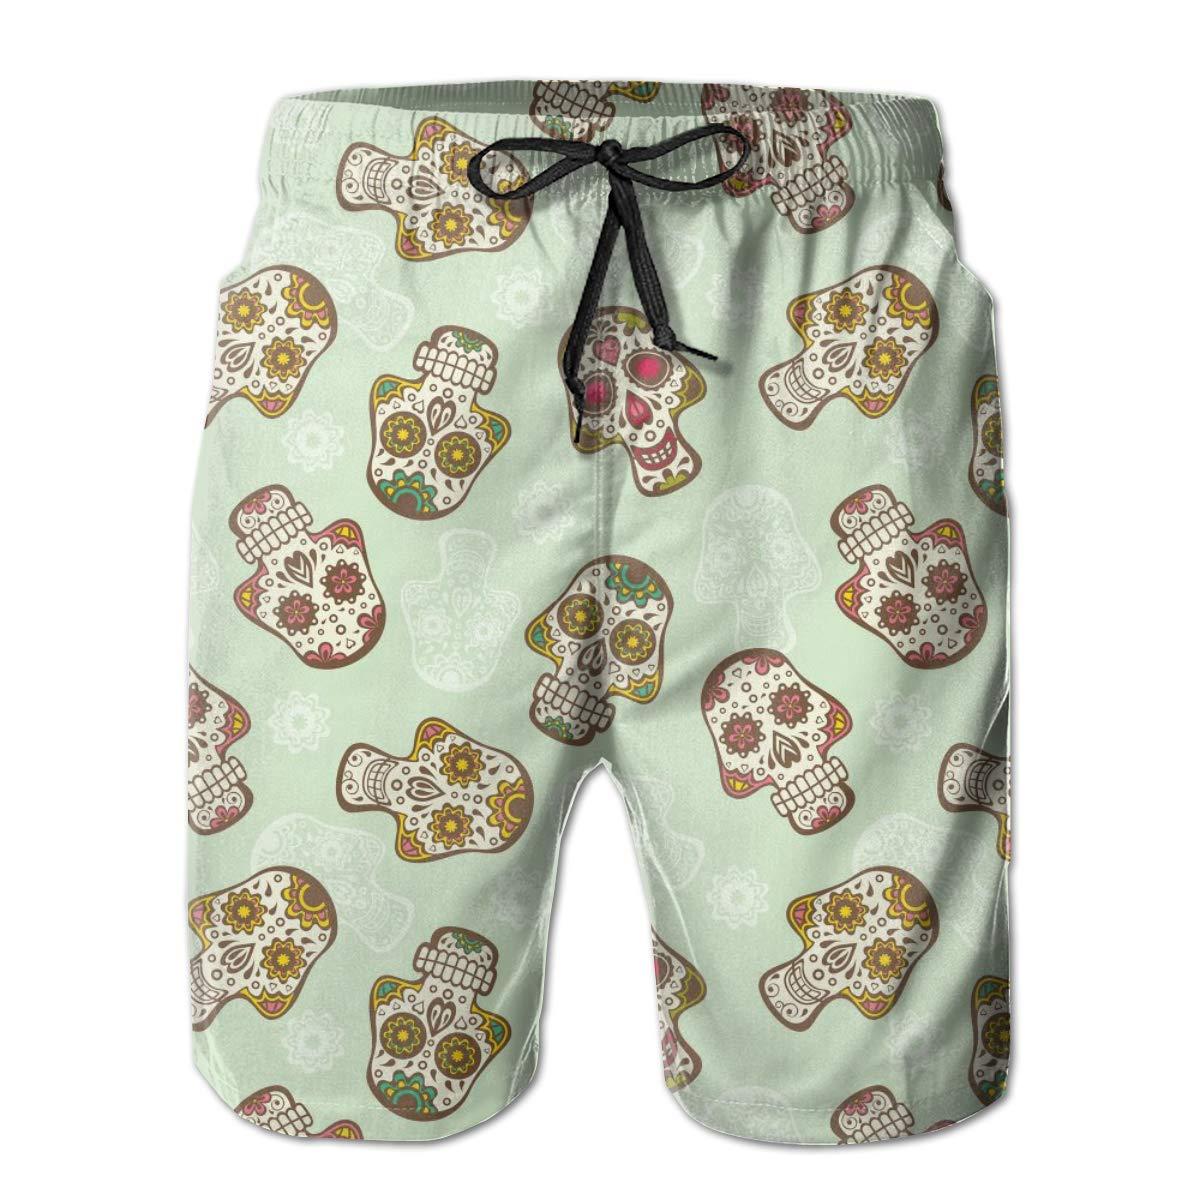 HZamora/_H Mens Skull Seamless Pattern Summer Breathable Quick-Drying Swim Trunks Beach Shorts Cargo Shorts